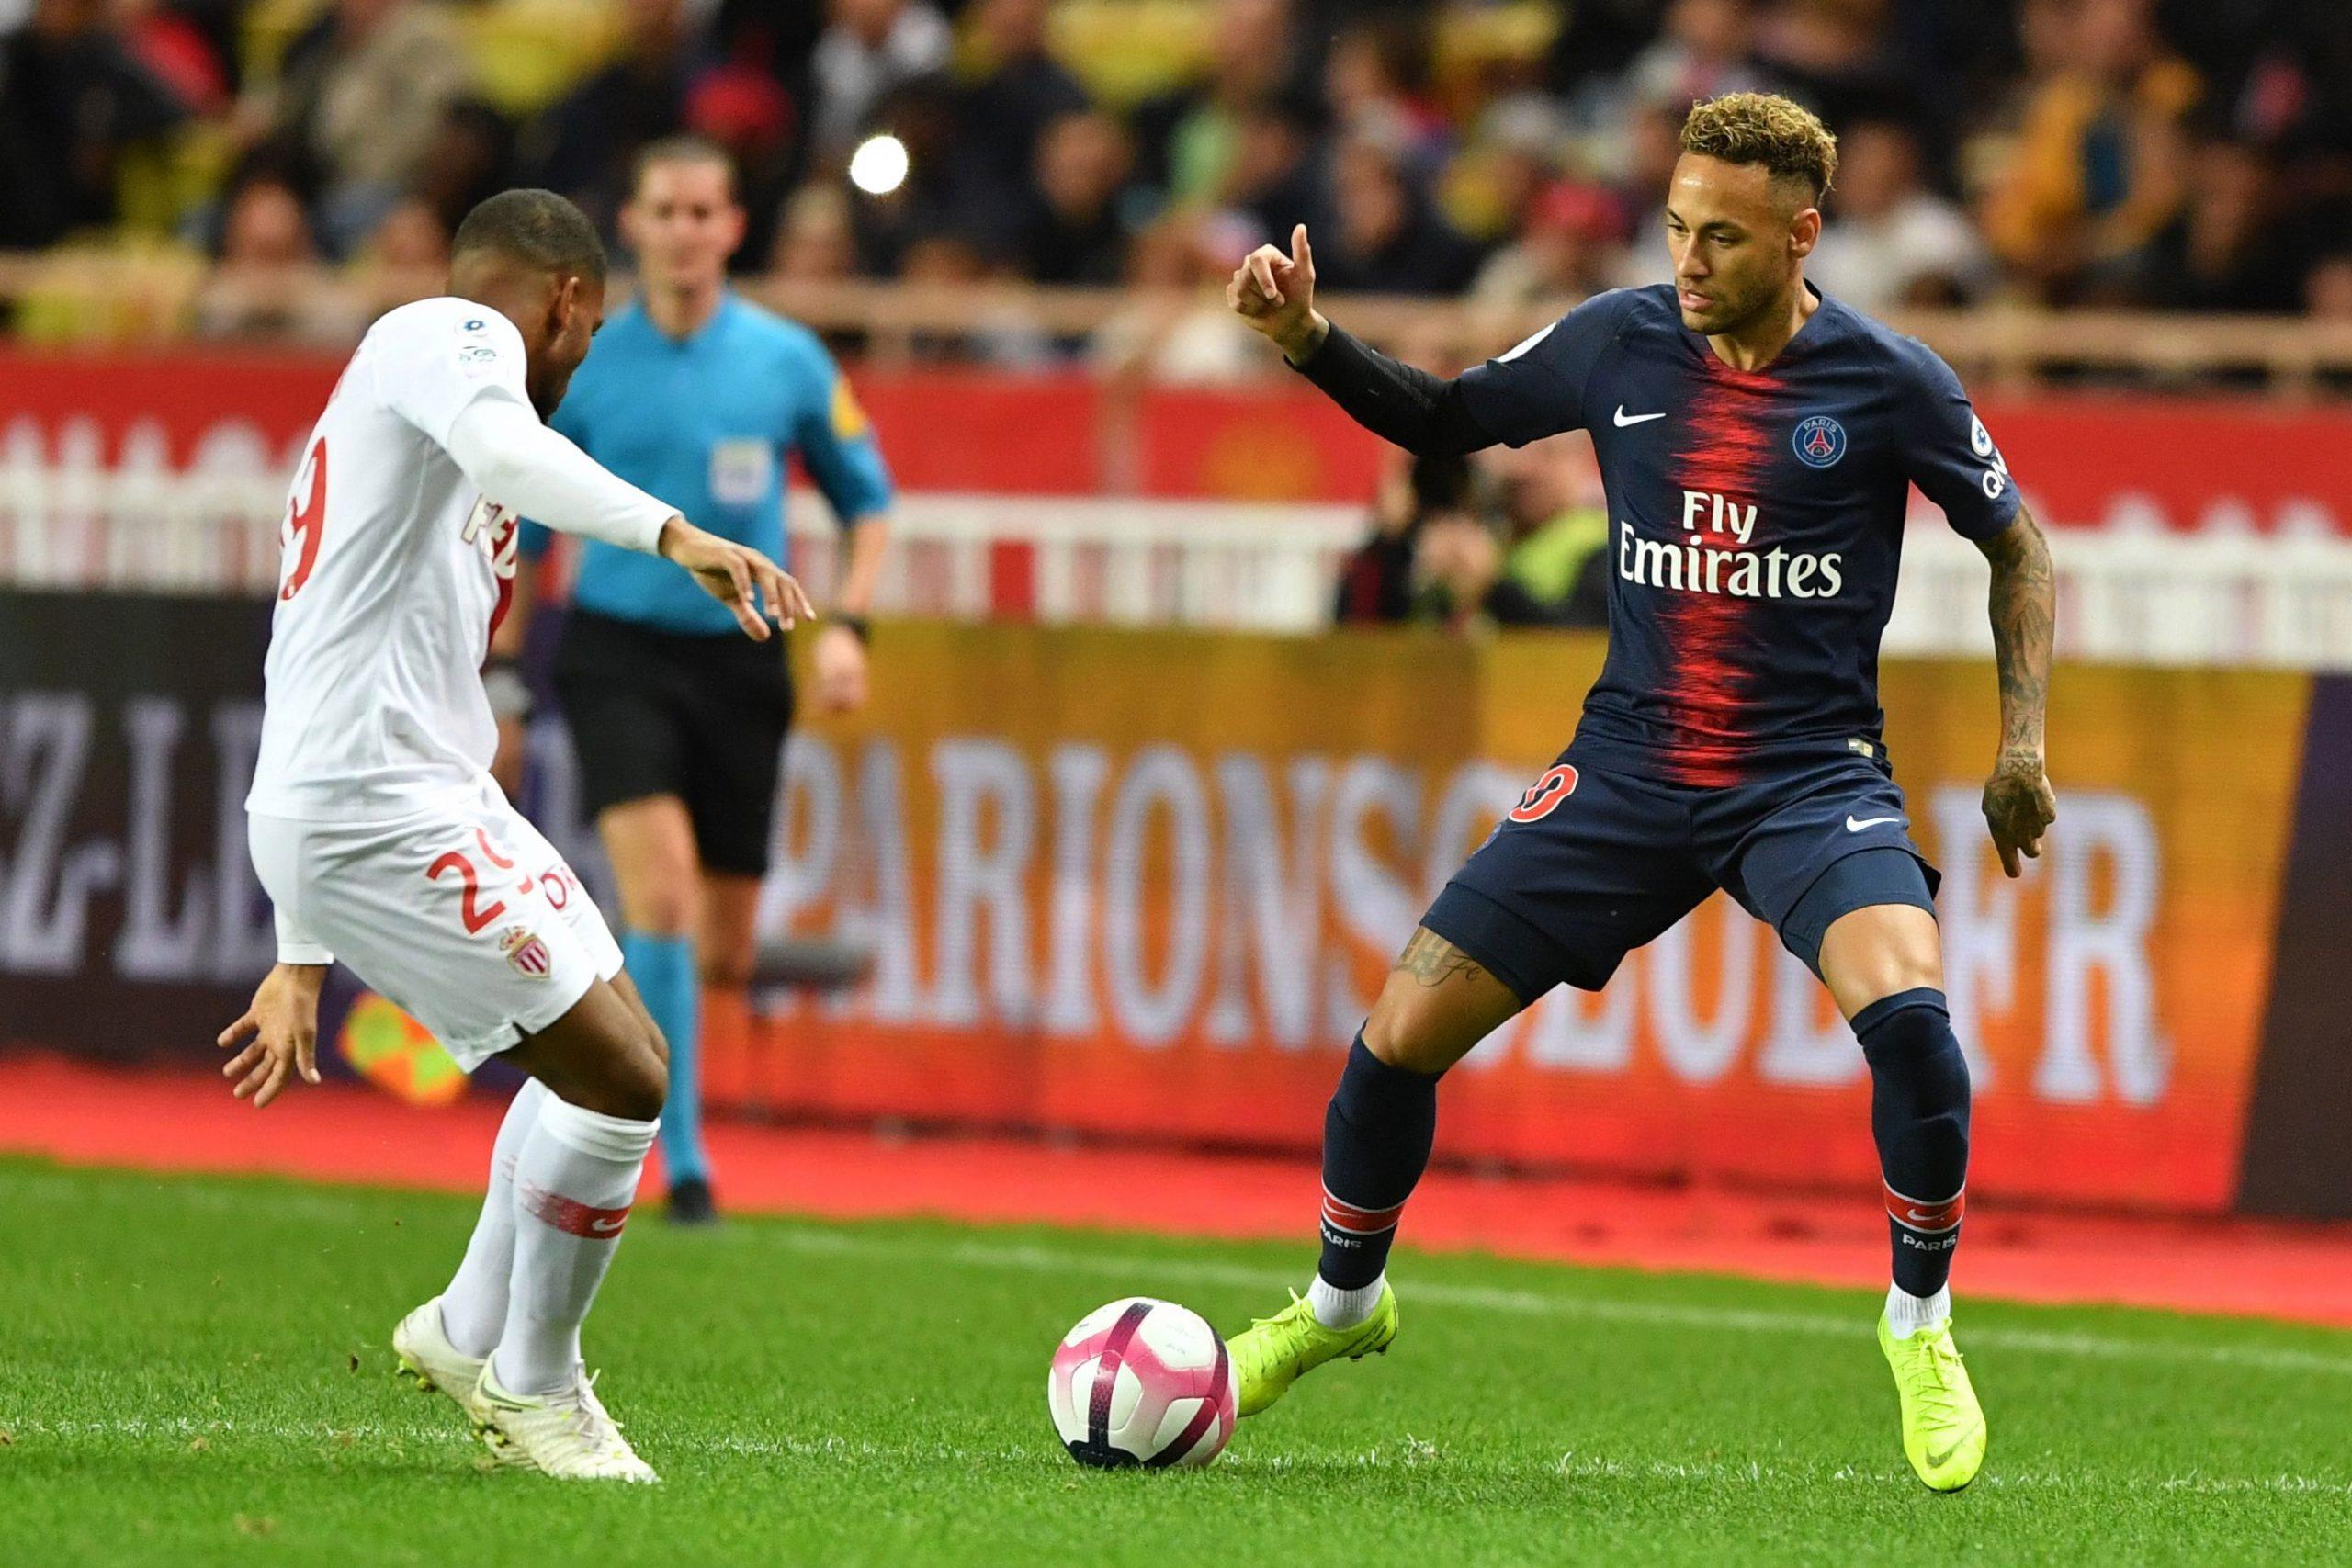 Soi kèo Monaco vs PSG, 2h15 ngày 20/5 – Cúp quốc gia Pháp